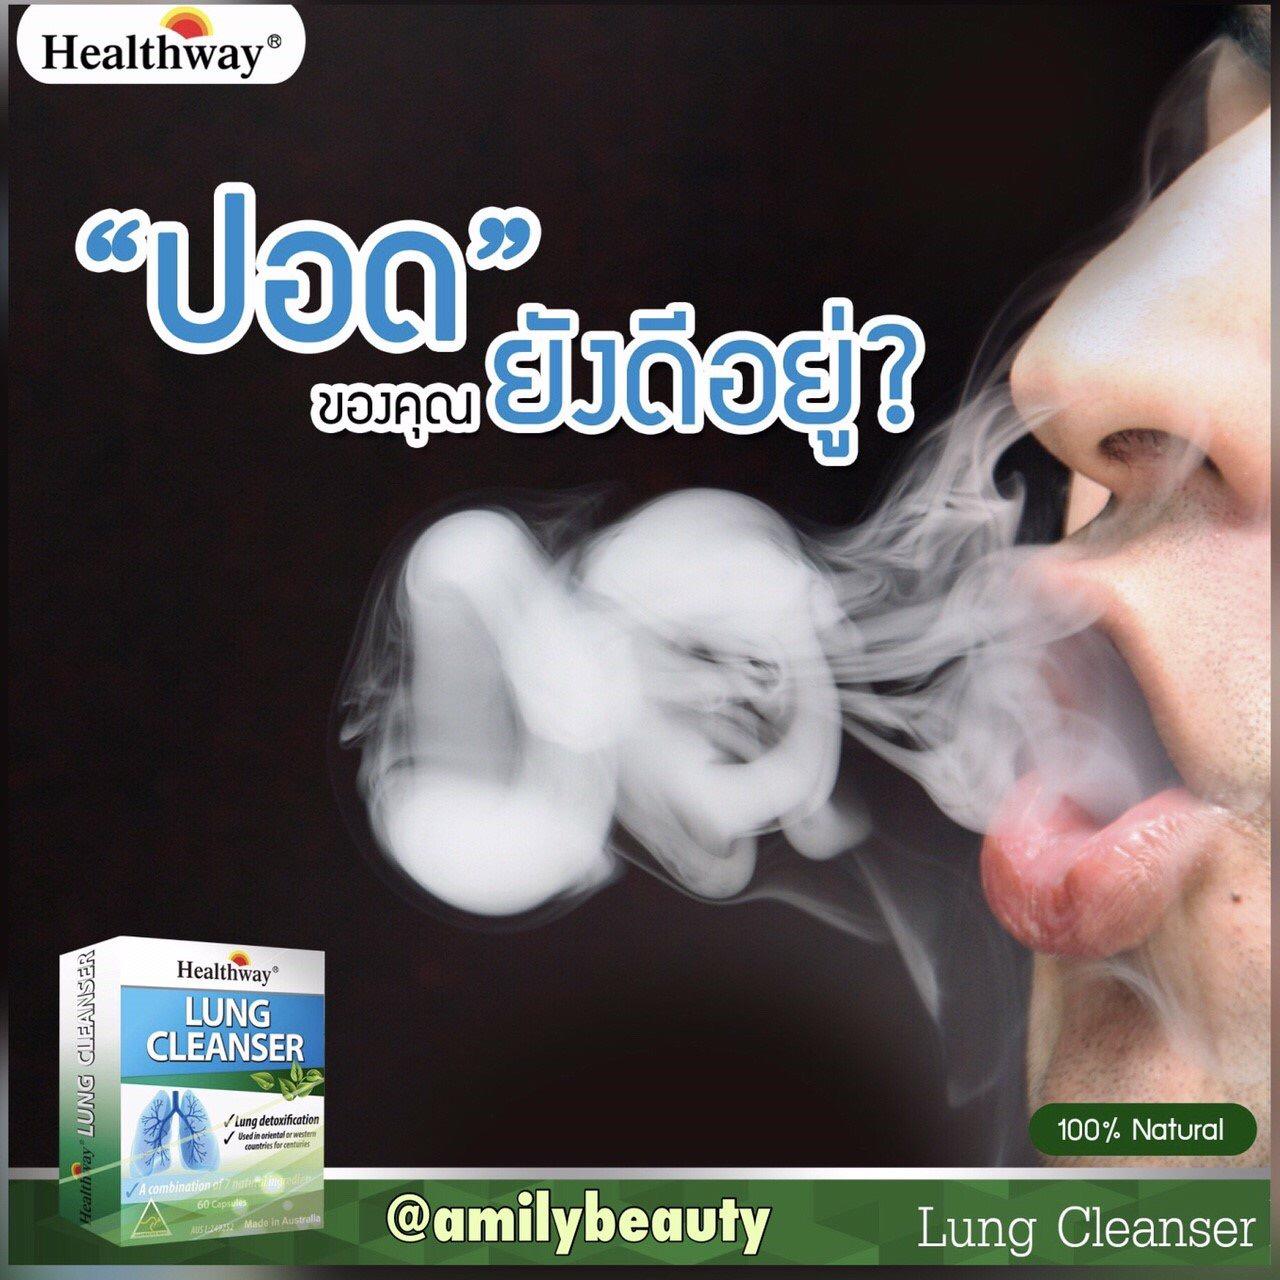 Healthway Lung Cleanser วิตามินล้างสารพิษปอดเฮลท์เวย์ 60 แคปซูล